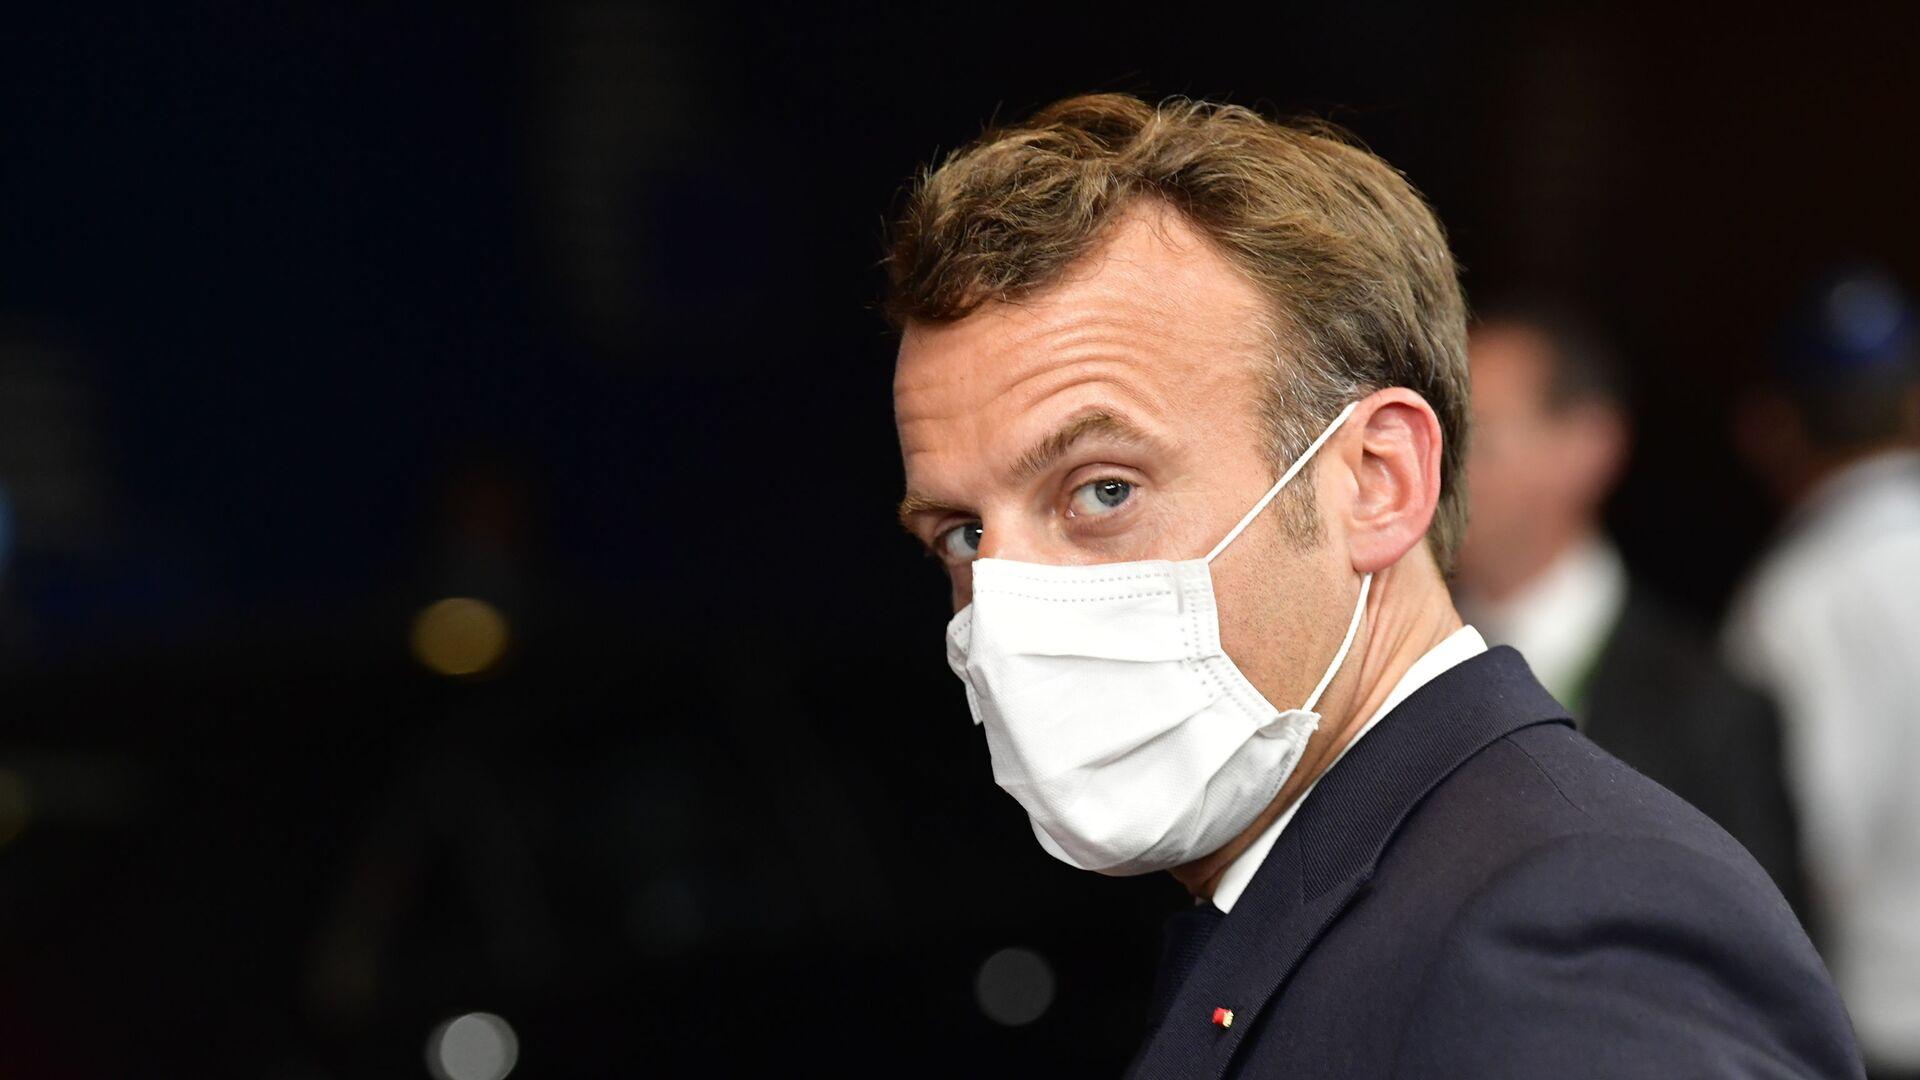 Emmanuel Macron - Sputnik Mundo, 1920, 22.07.2021